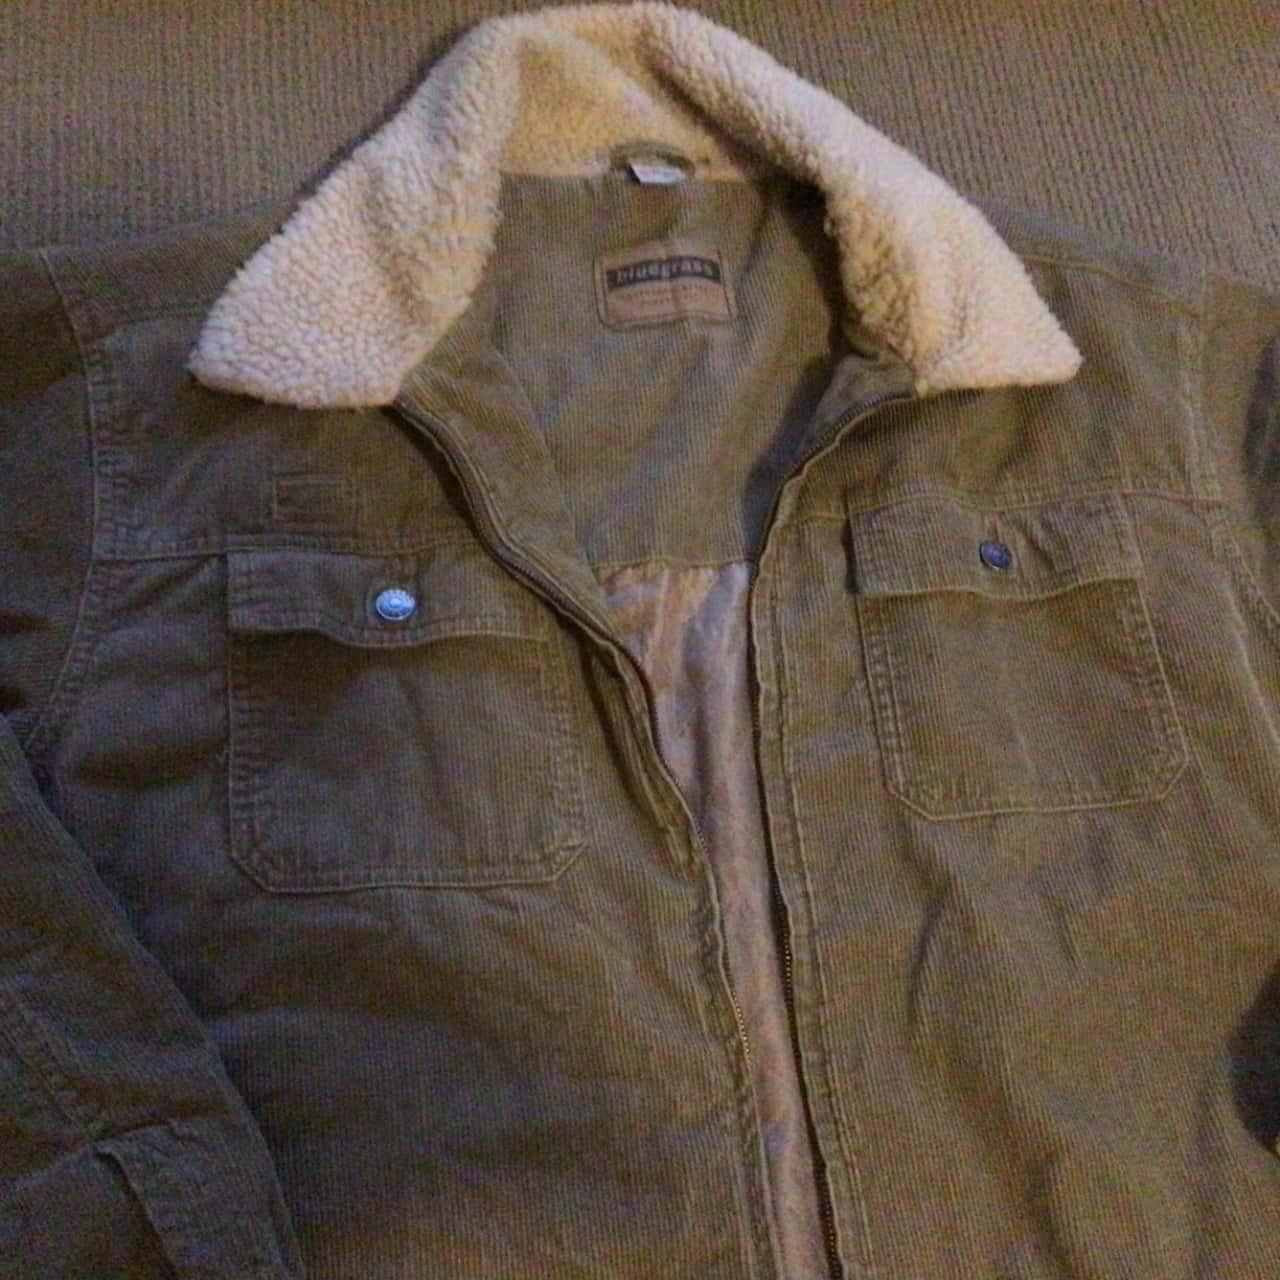 Mens  Bluegrass (Target) Vintage Style Corduroy Jacket Size XL Green